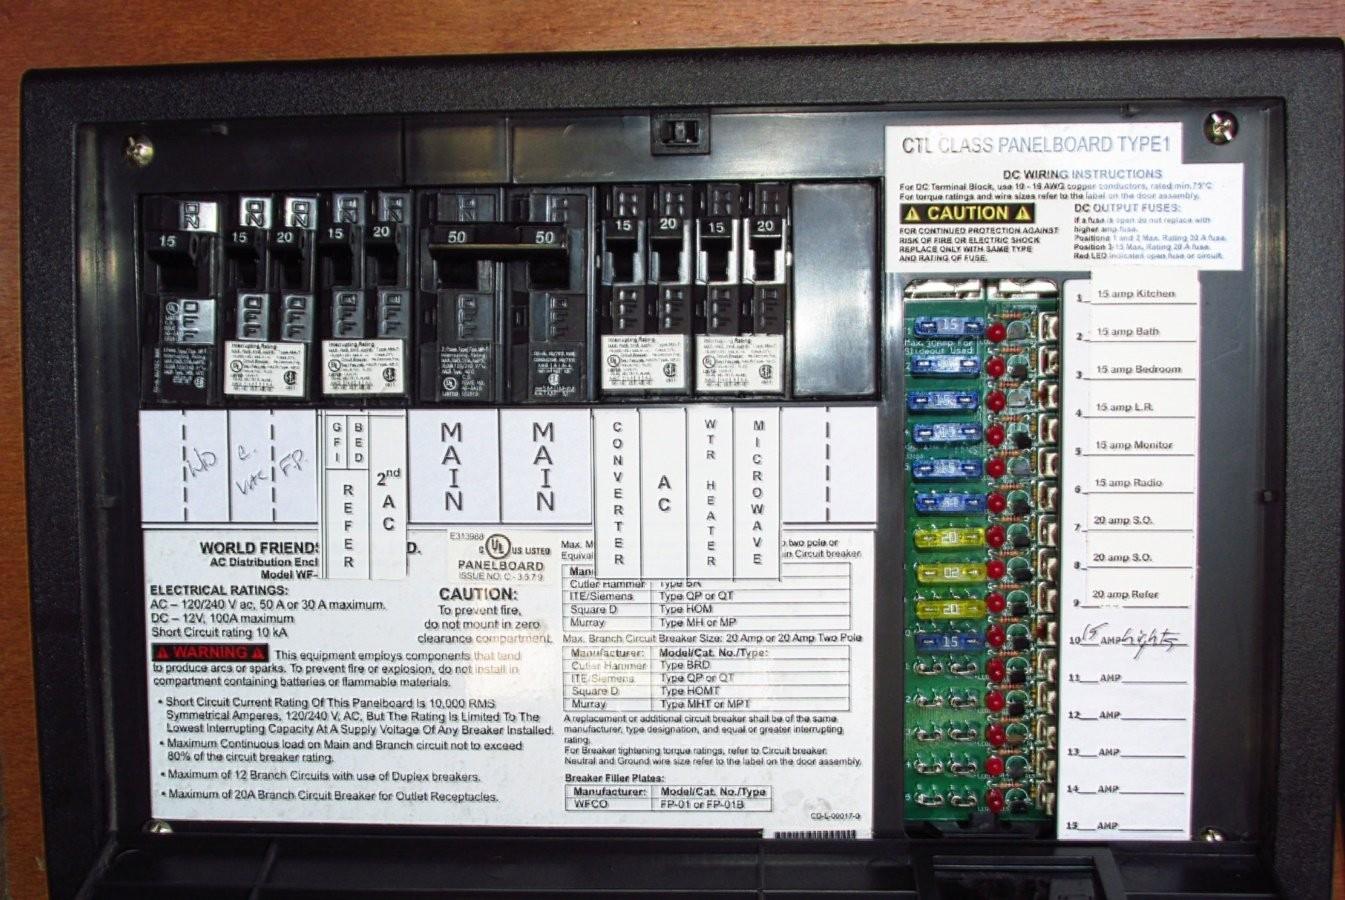 Elegant 30 Amp Rv Wiring Diagram 27 In Single Pole Switch Wiring Diagram with 30 Amp Rv Wiring Diagram